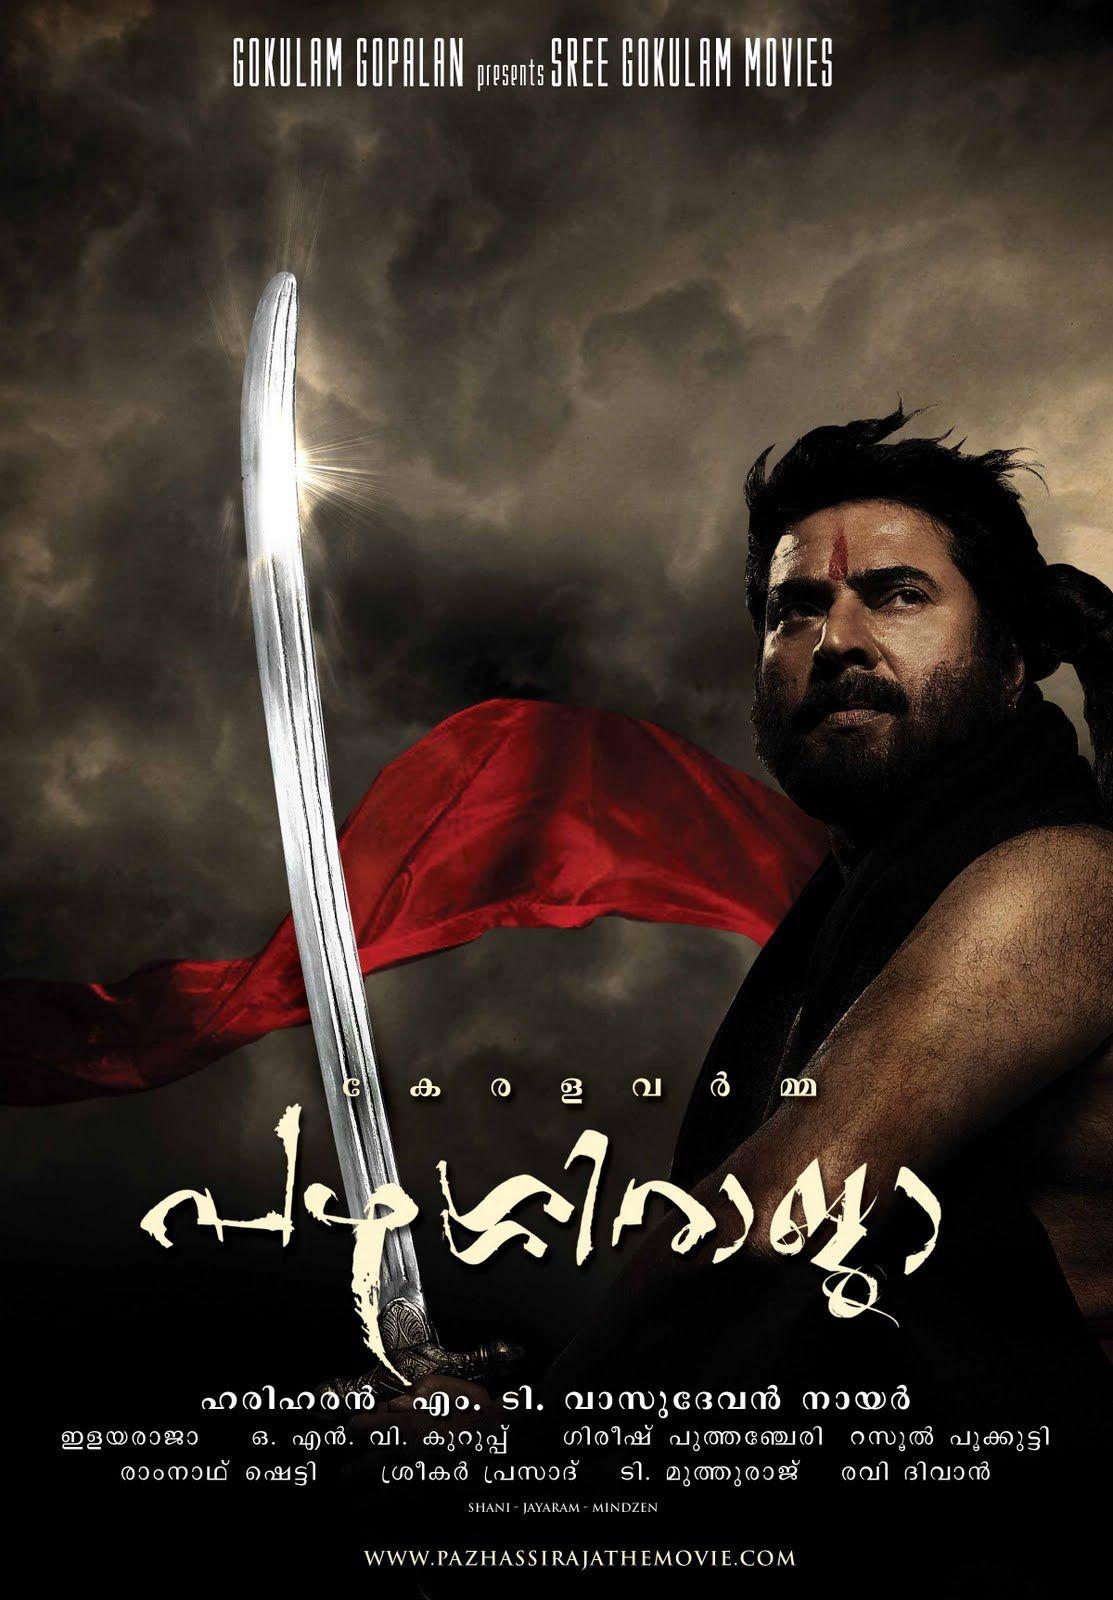 Malayalam Film Poster Graphics Print In 2018 Pinterest Film